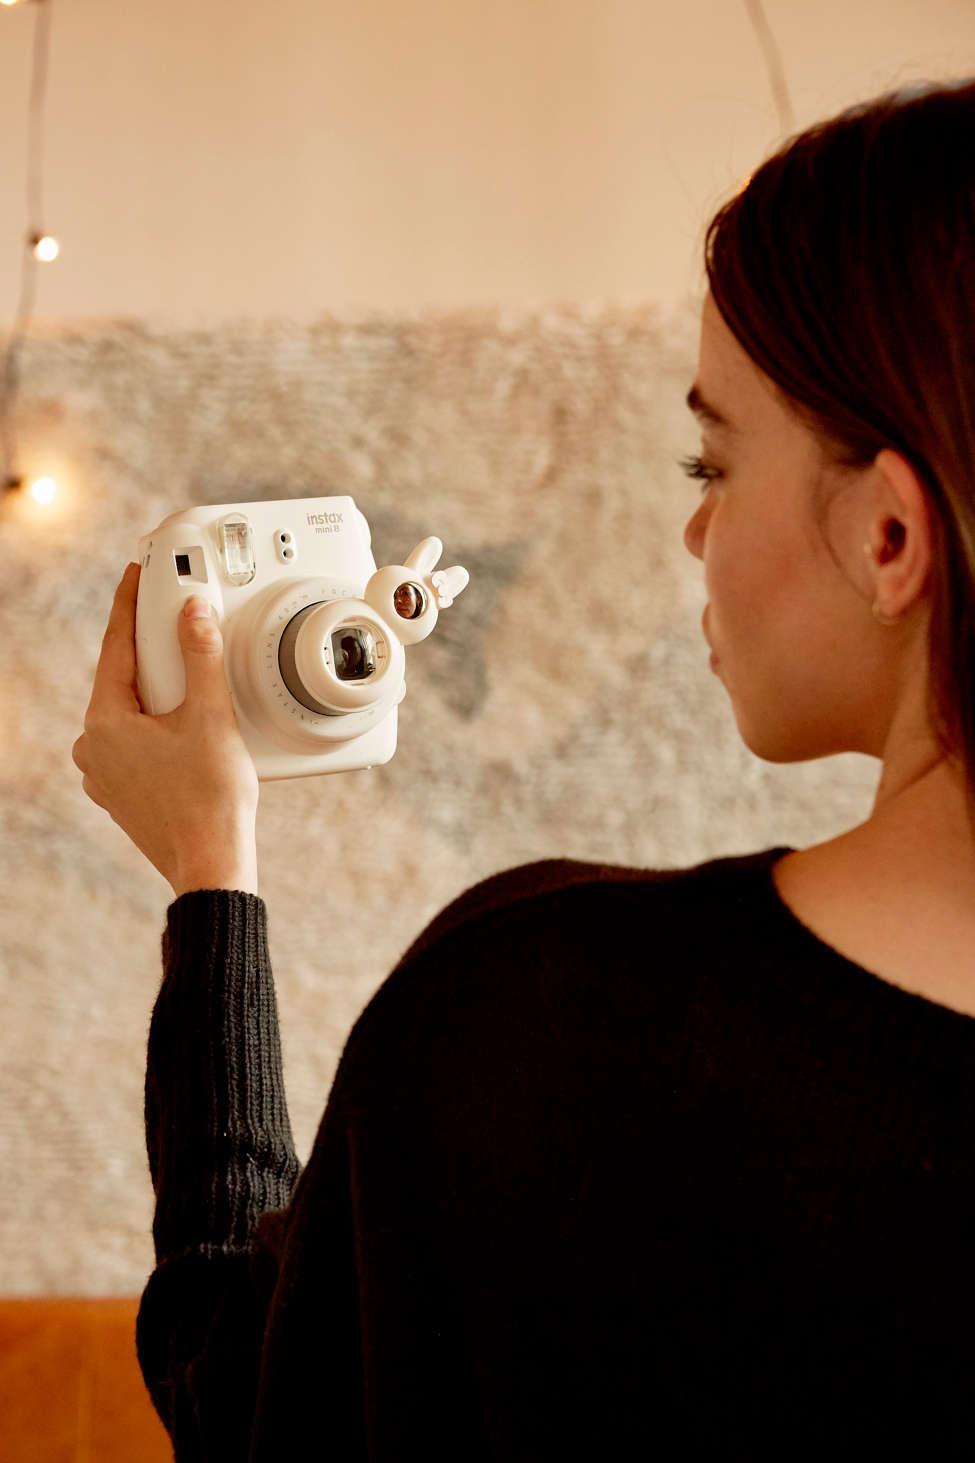 Fujifilm bunny selfie lens